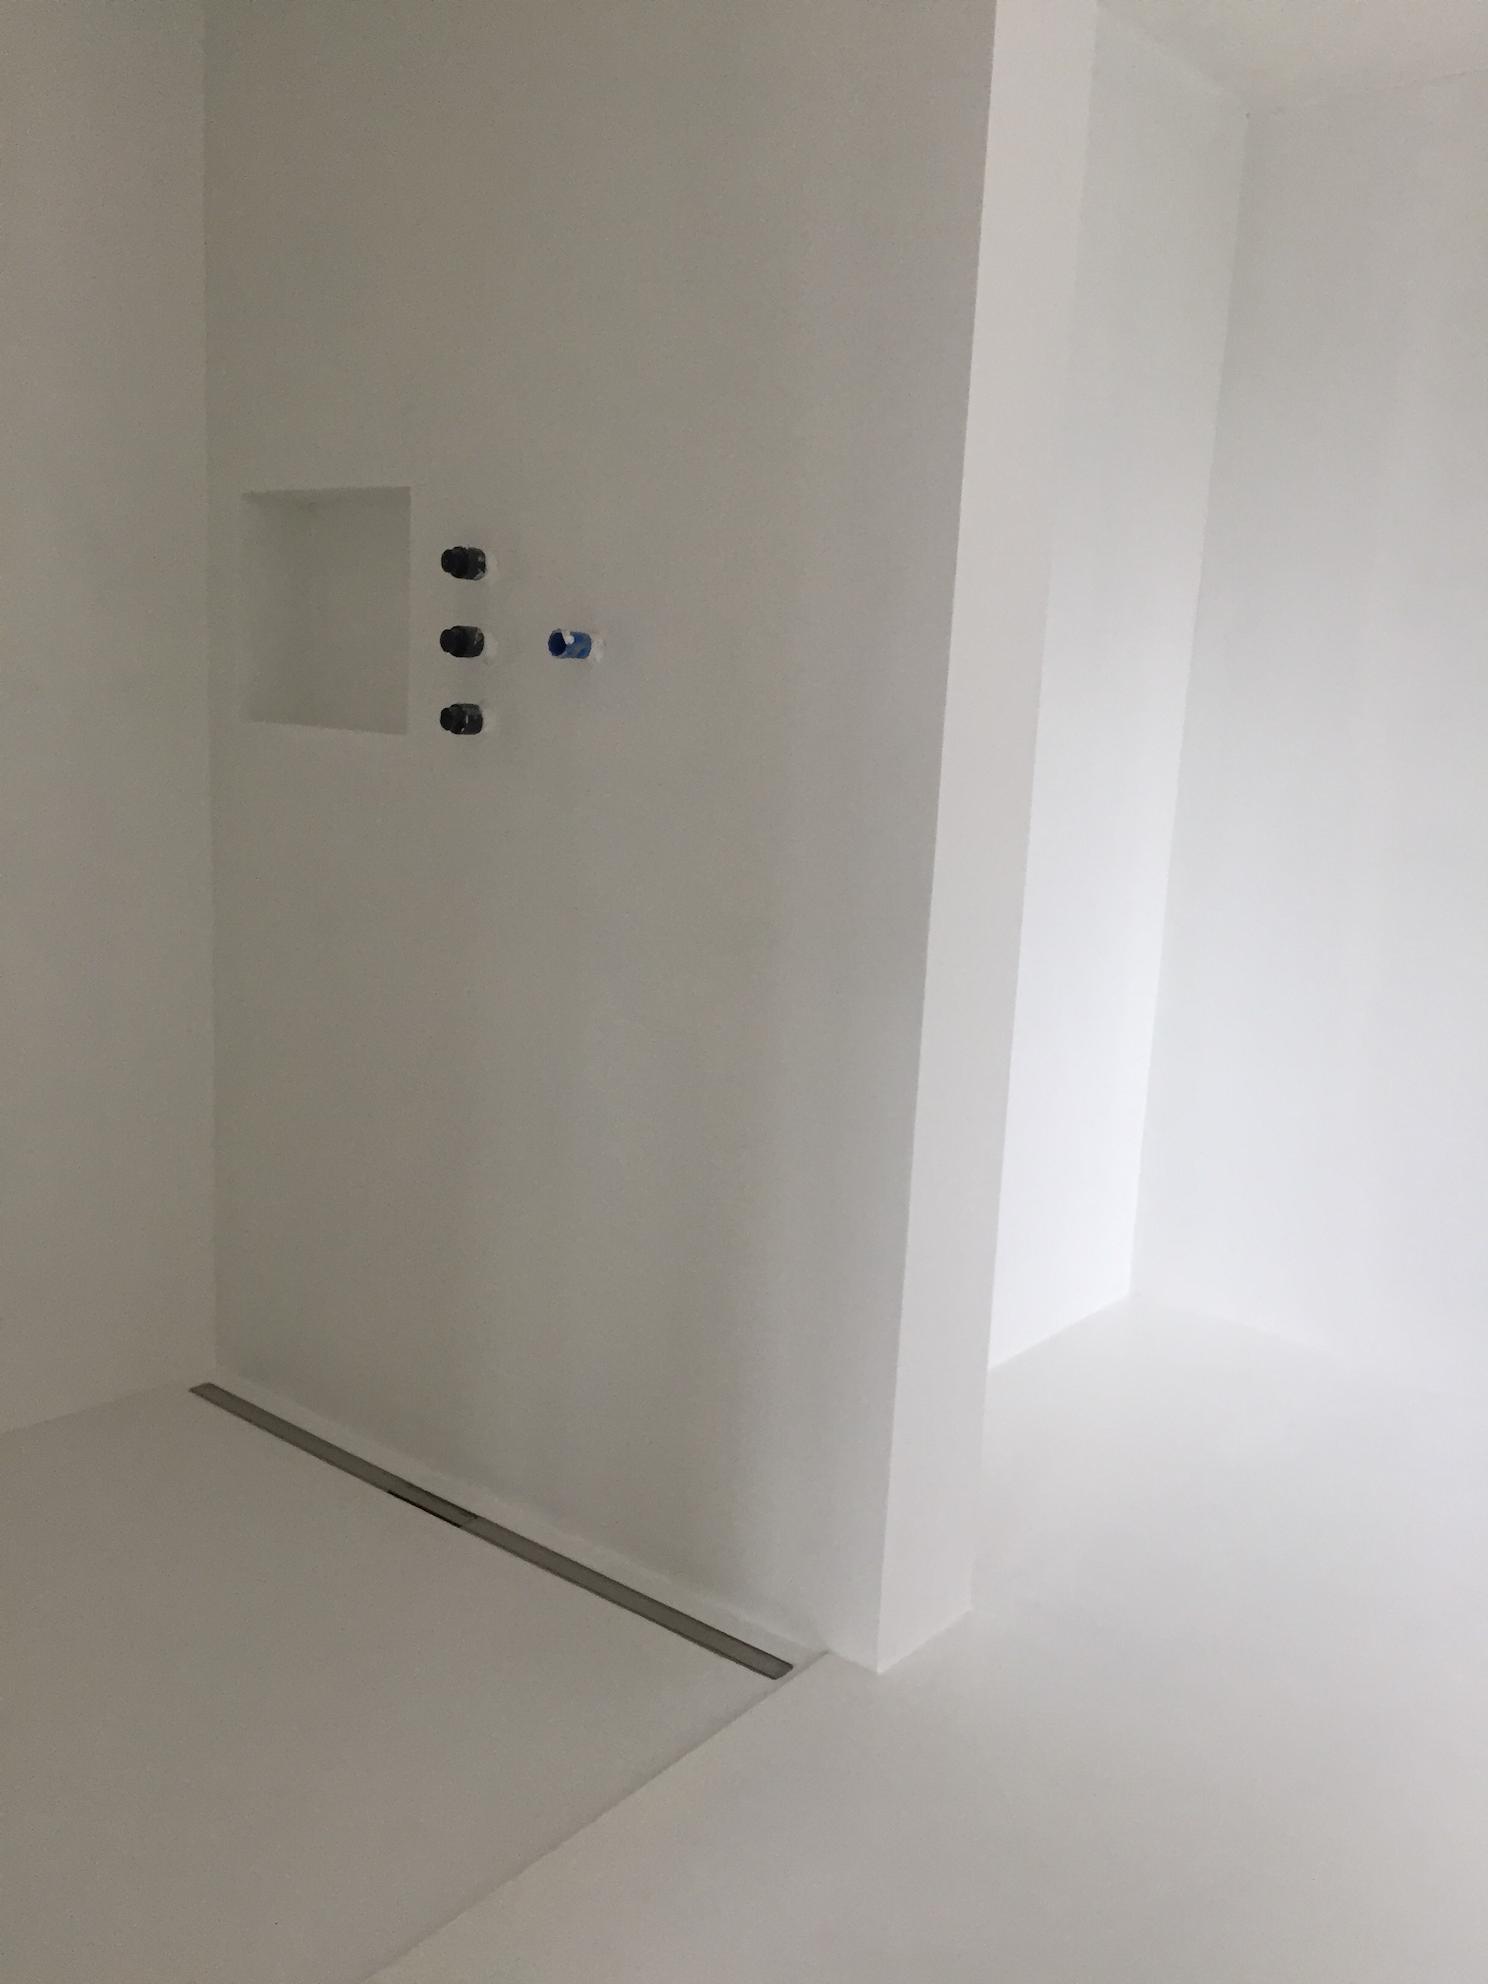 Artundcolour Fugenloser Wand Bodenbelag Liscio Bianco By Topciment In 2020 Wand Wande Spachteln Belag